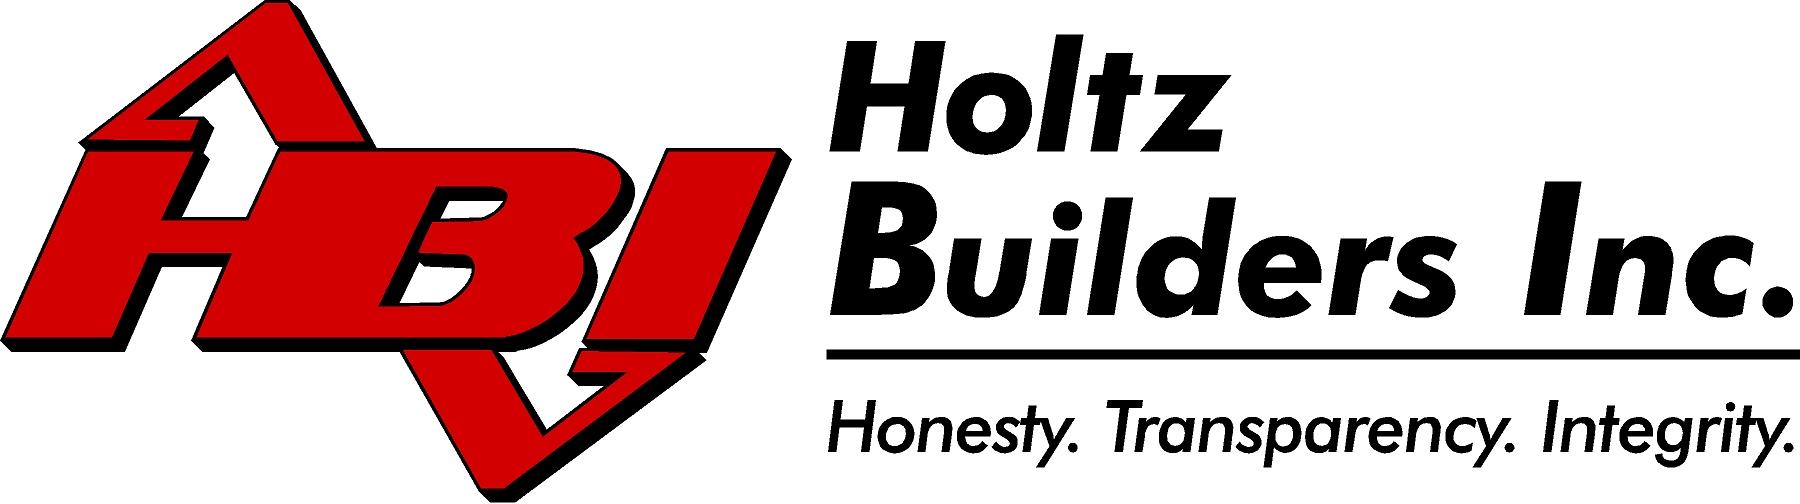 Holtz Builders, Inc logo